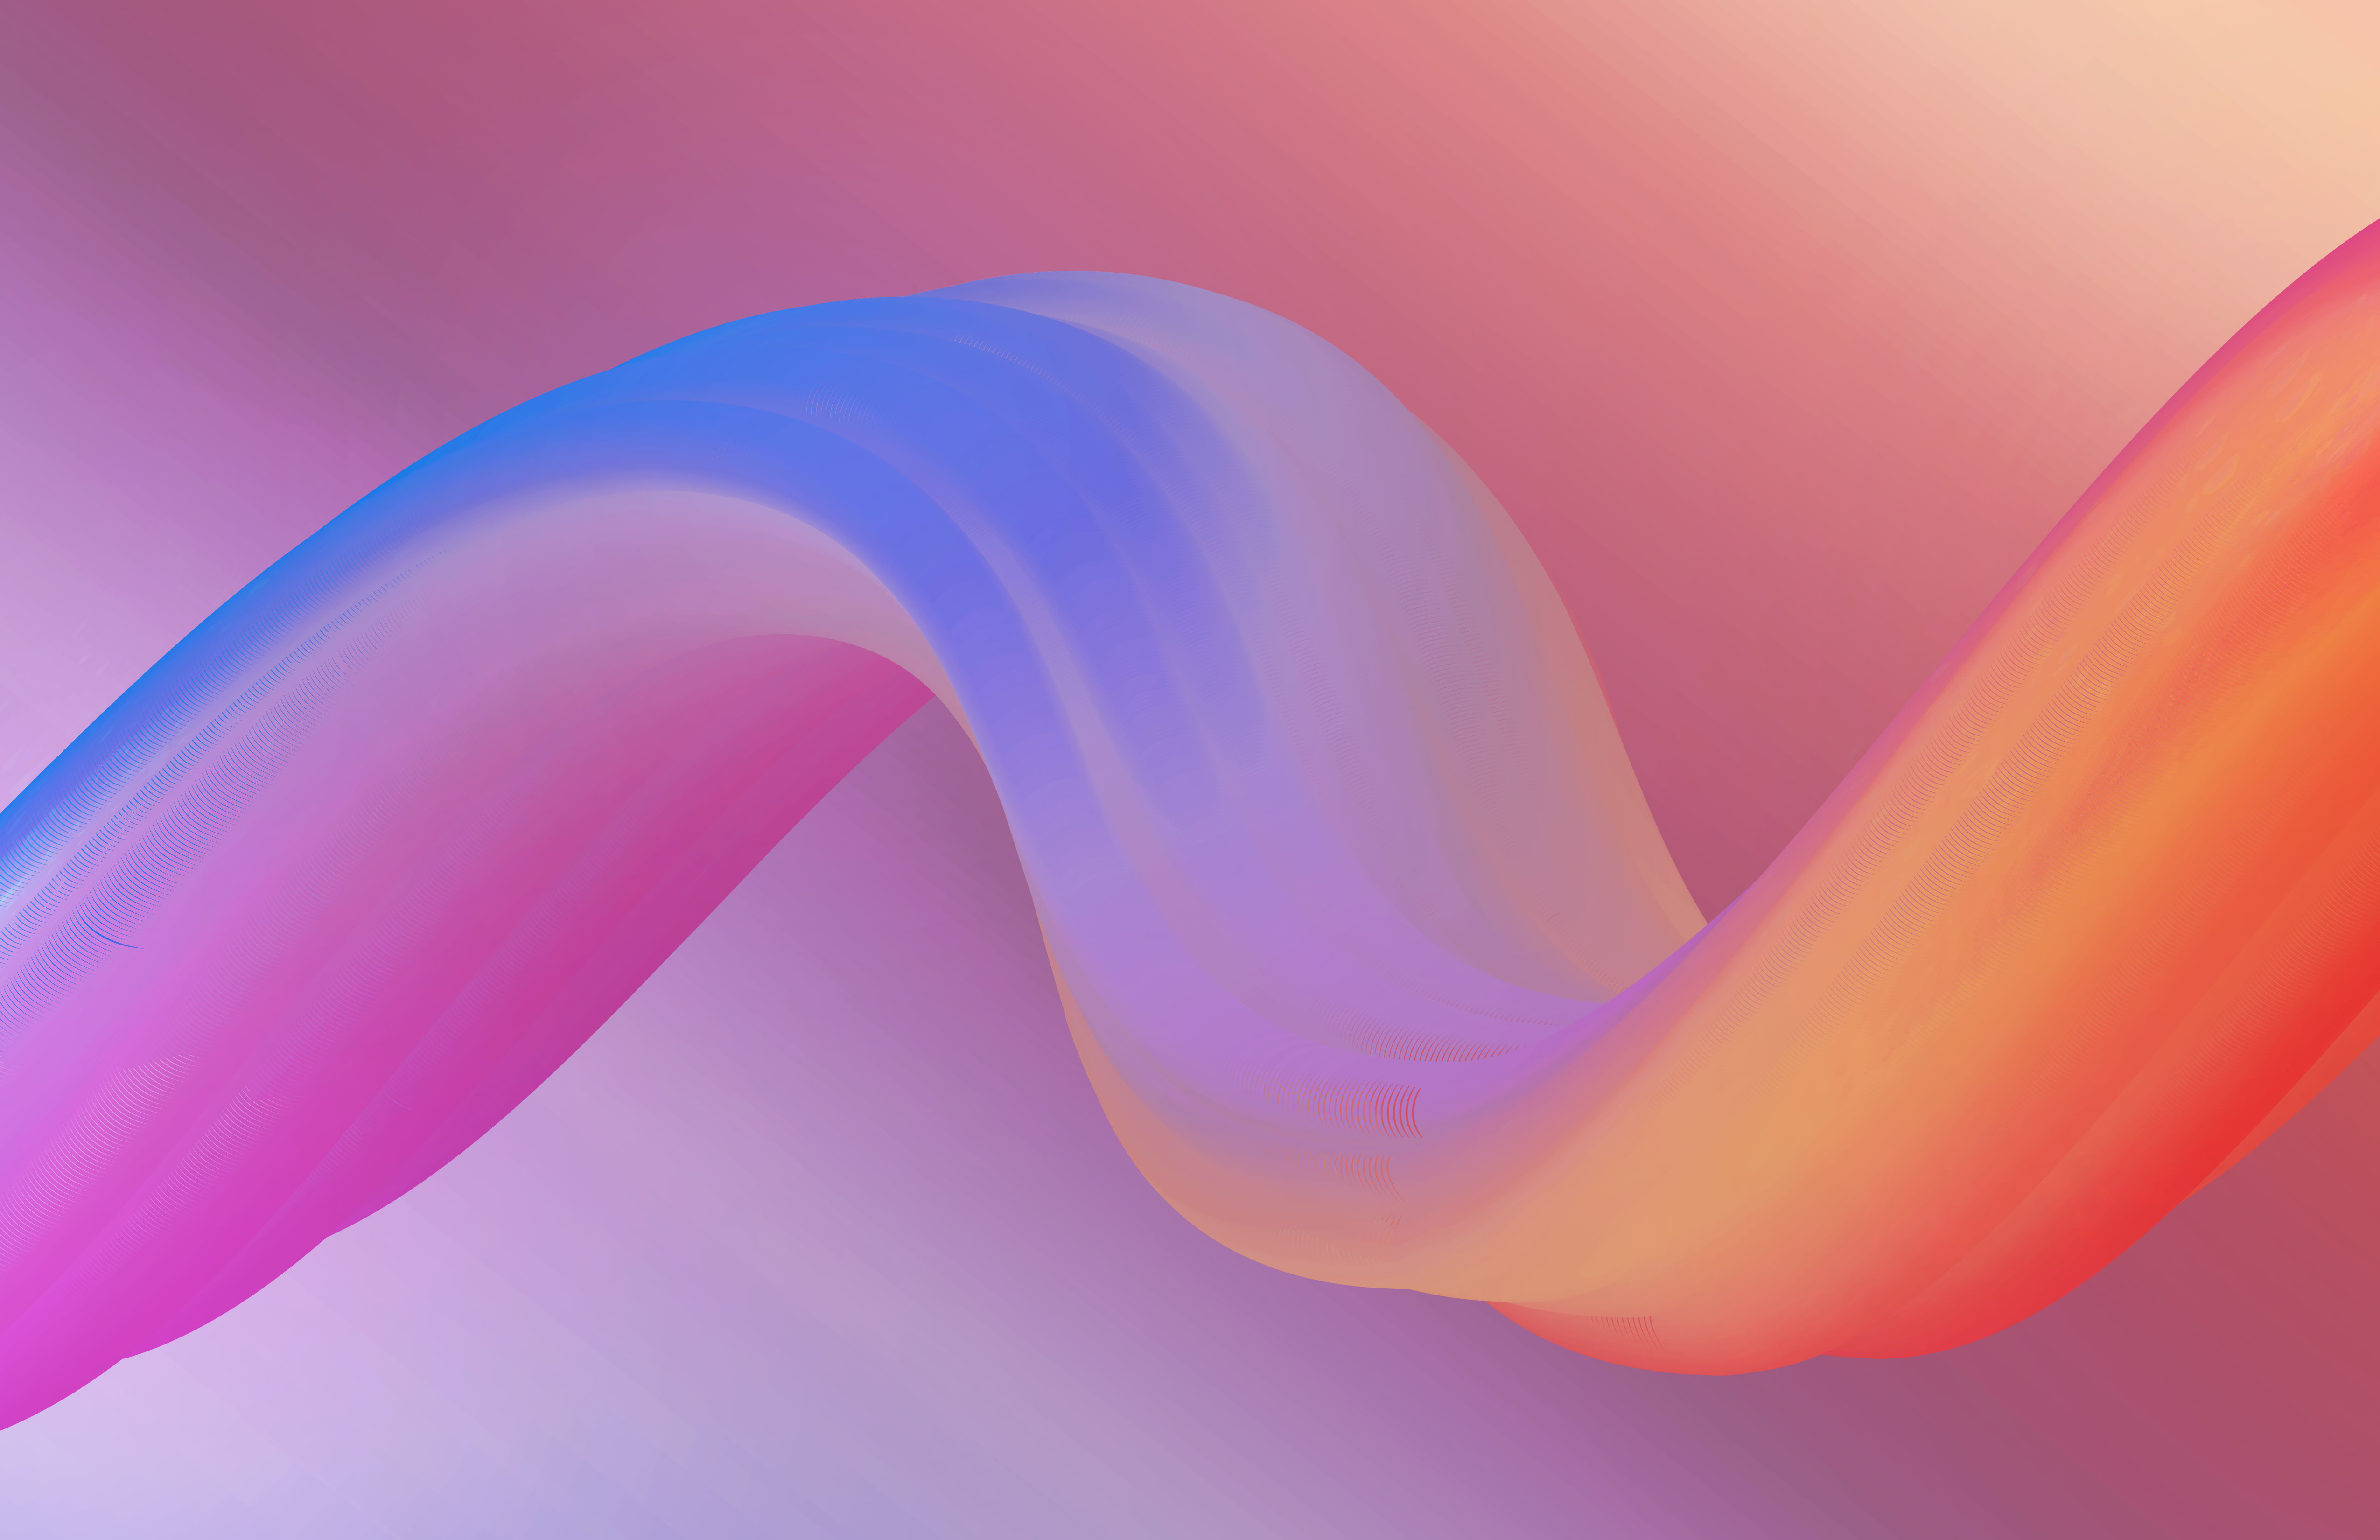 Colorful_Fluid_Wallpaper_01 (50078)   Backgrounds   Design ...